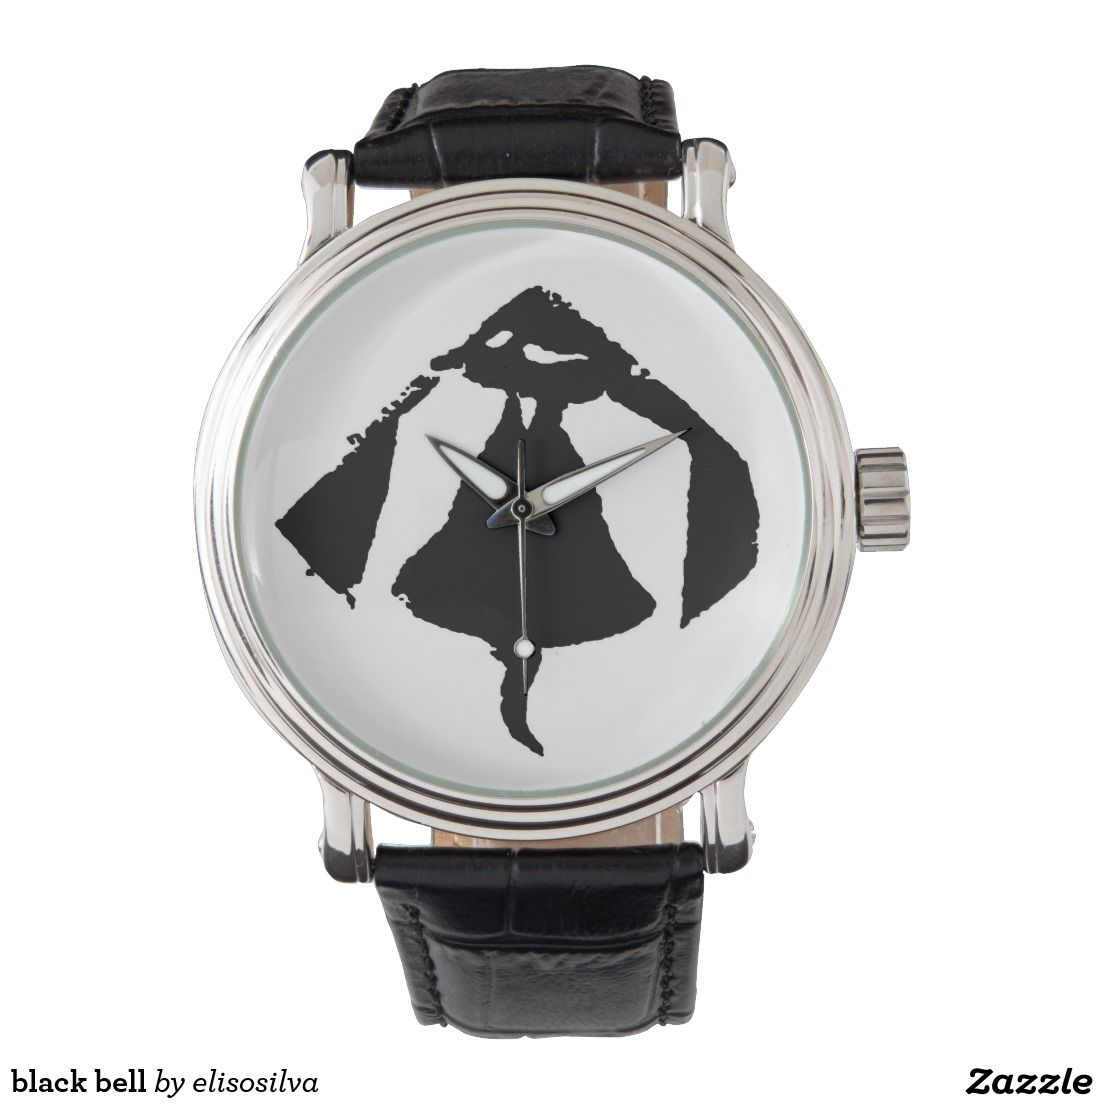 black bell relojes de mano